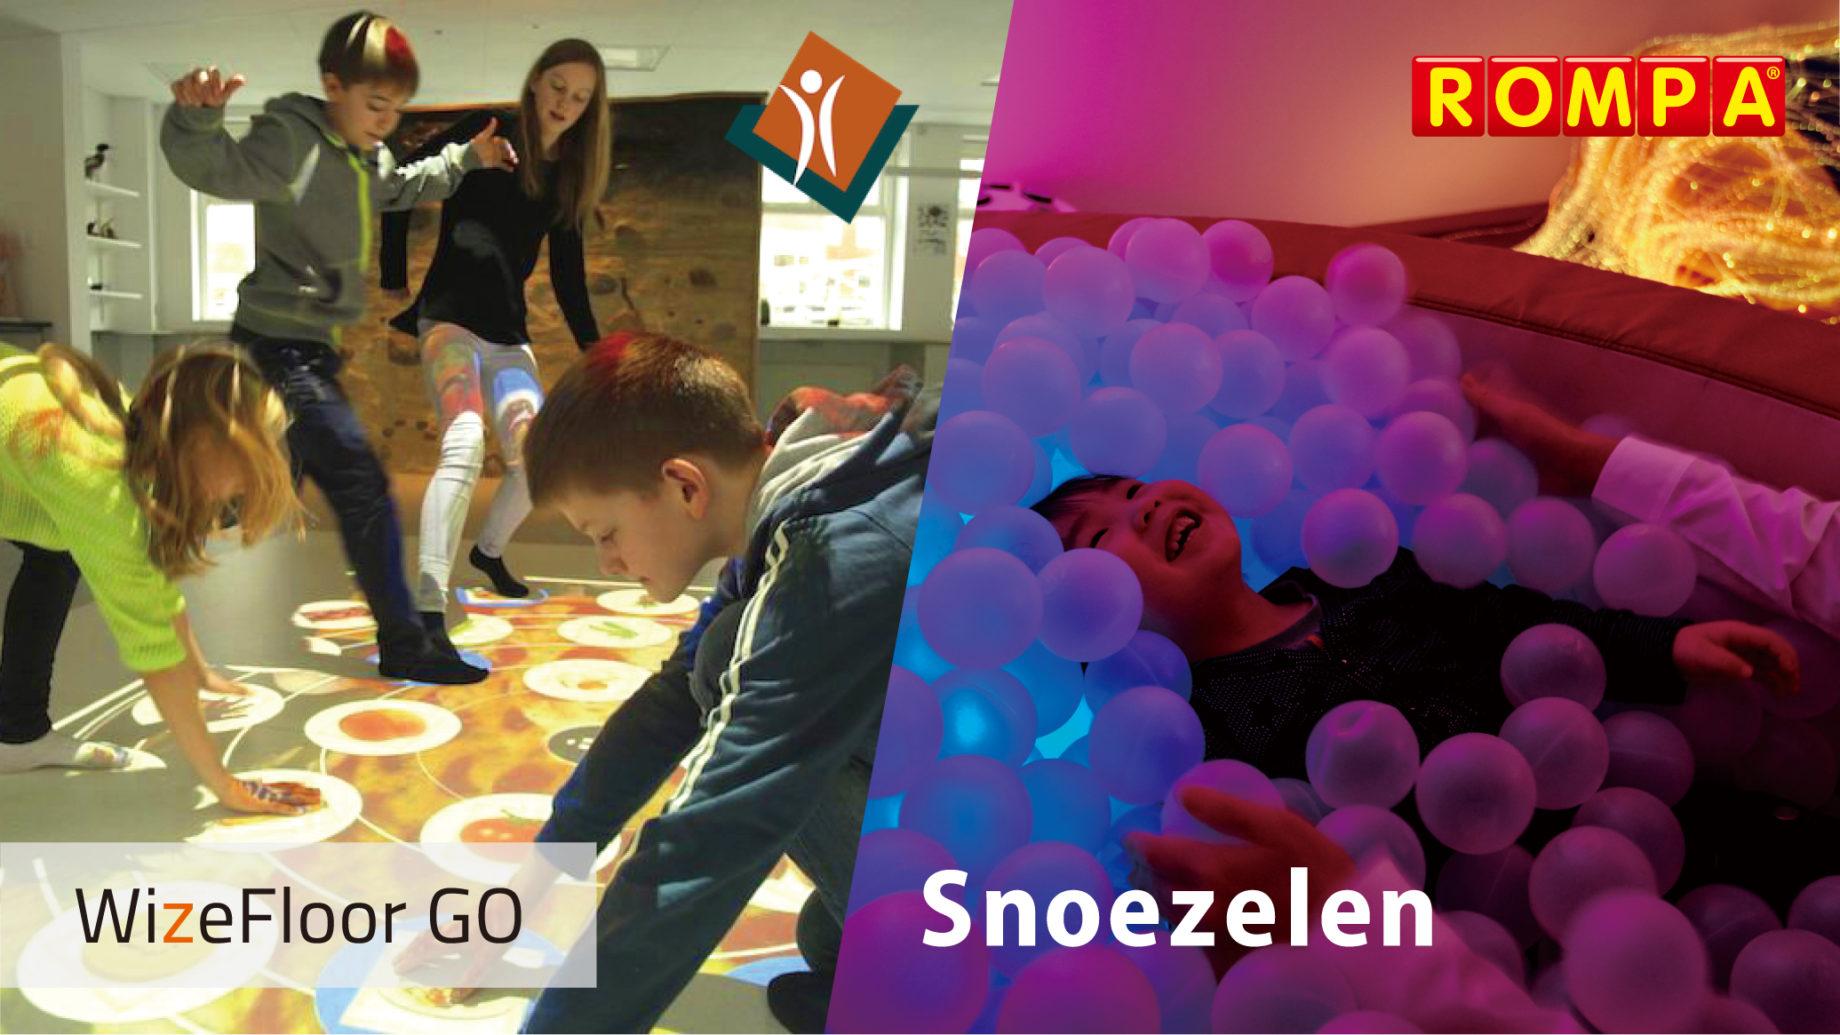 「Wize Floor Go」「スヌーズレン」の体験イベントを開催いたします!